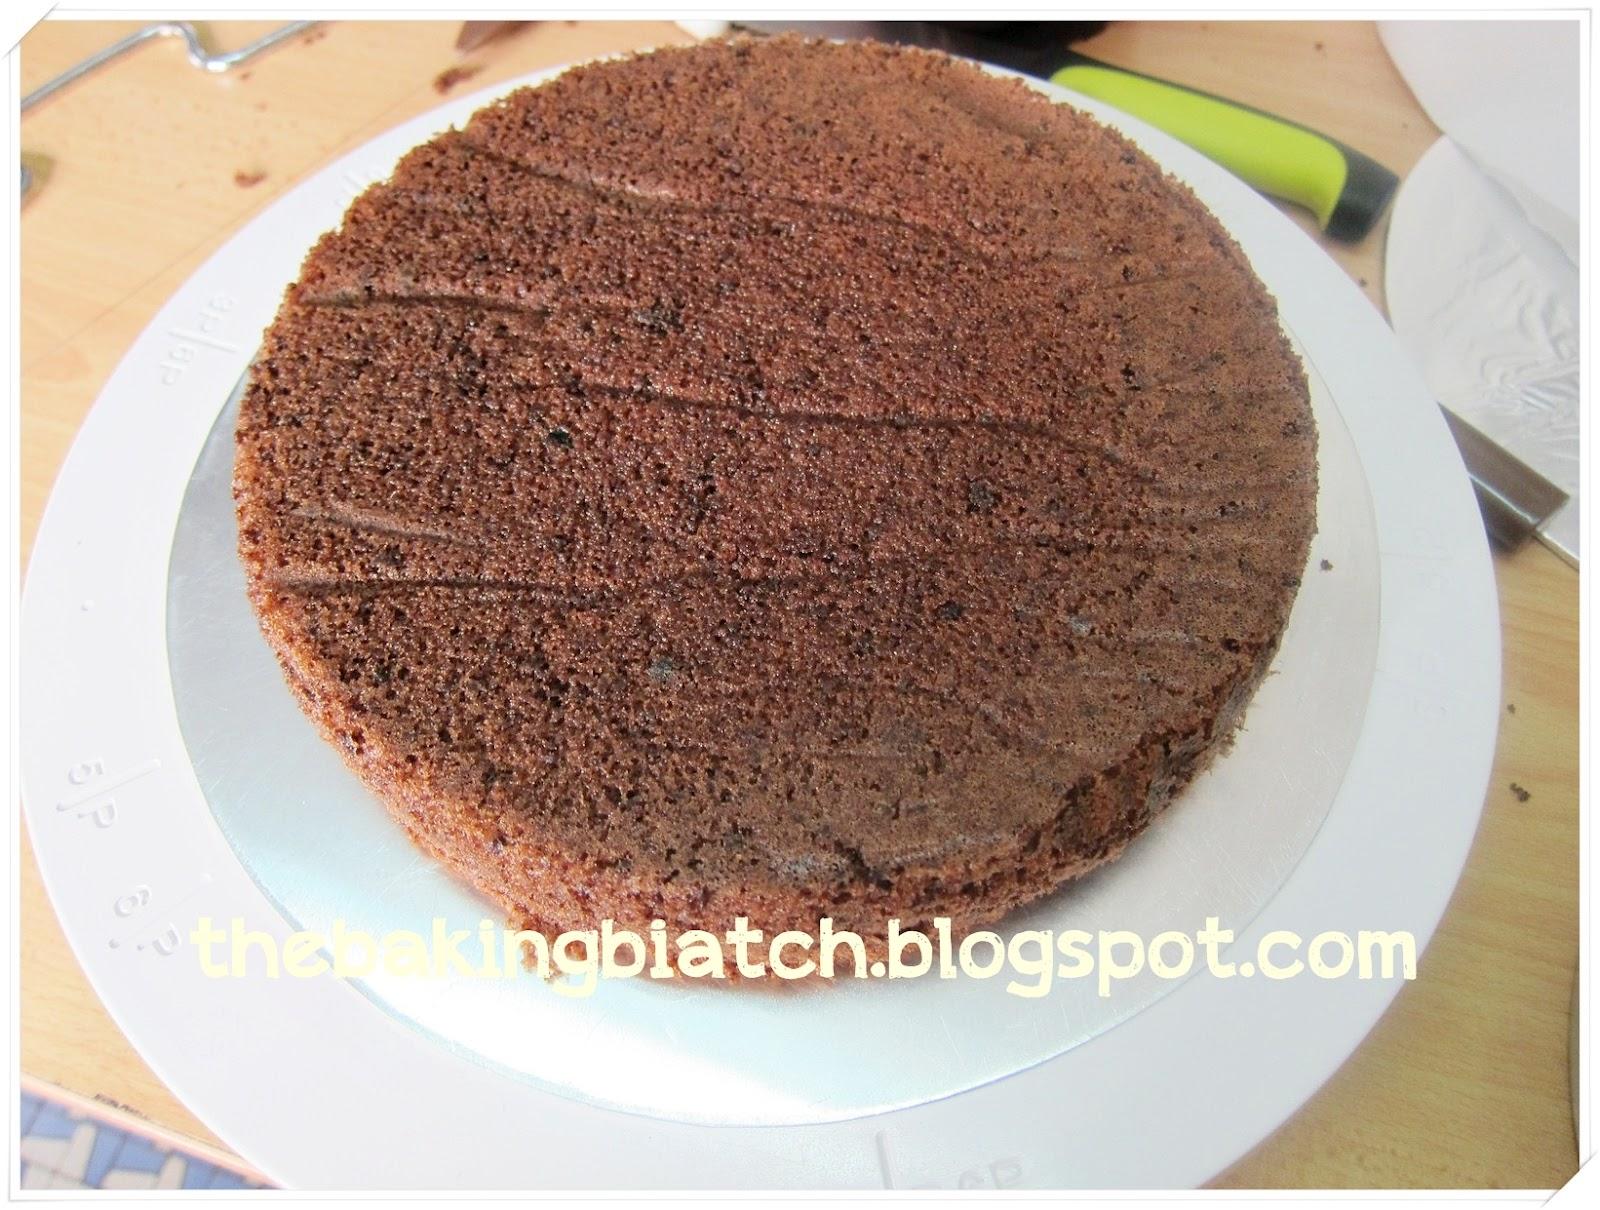 The Baking Biatch ♥: Time with Cynthia: Chocolate Sponge Cake